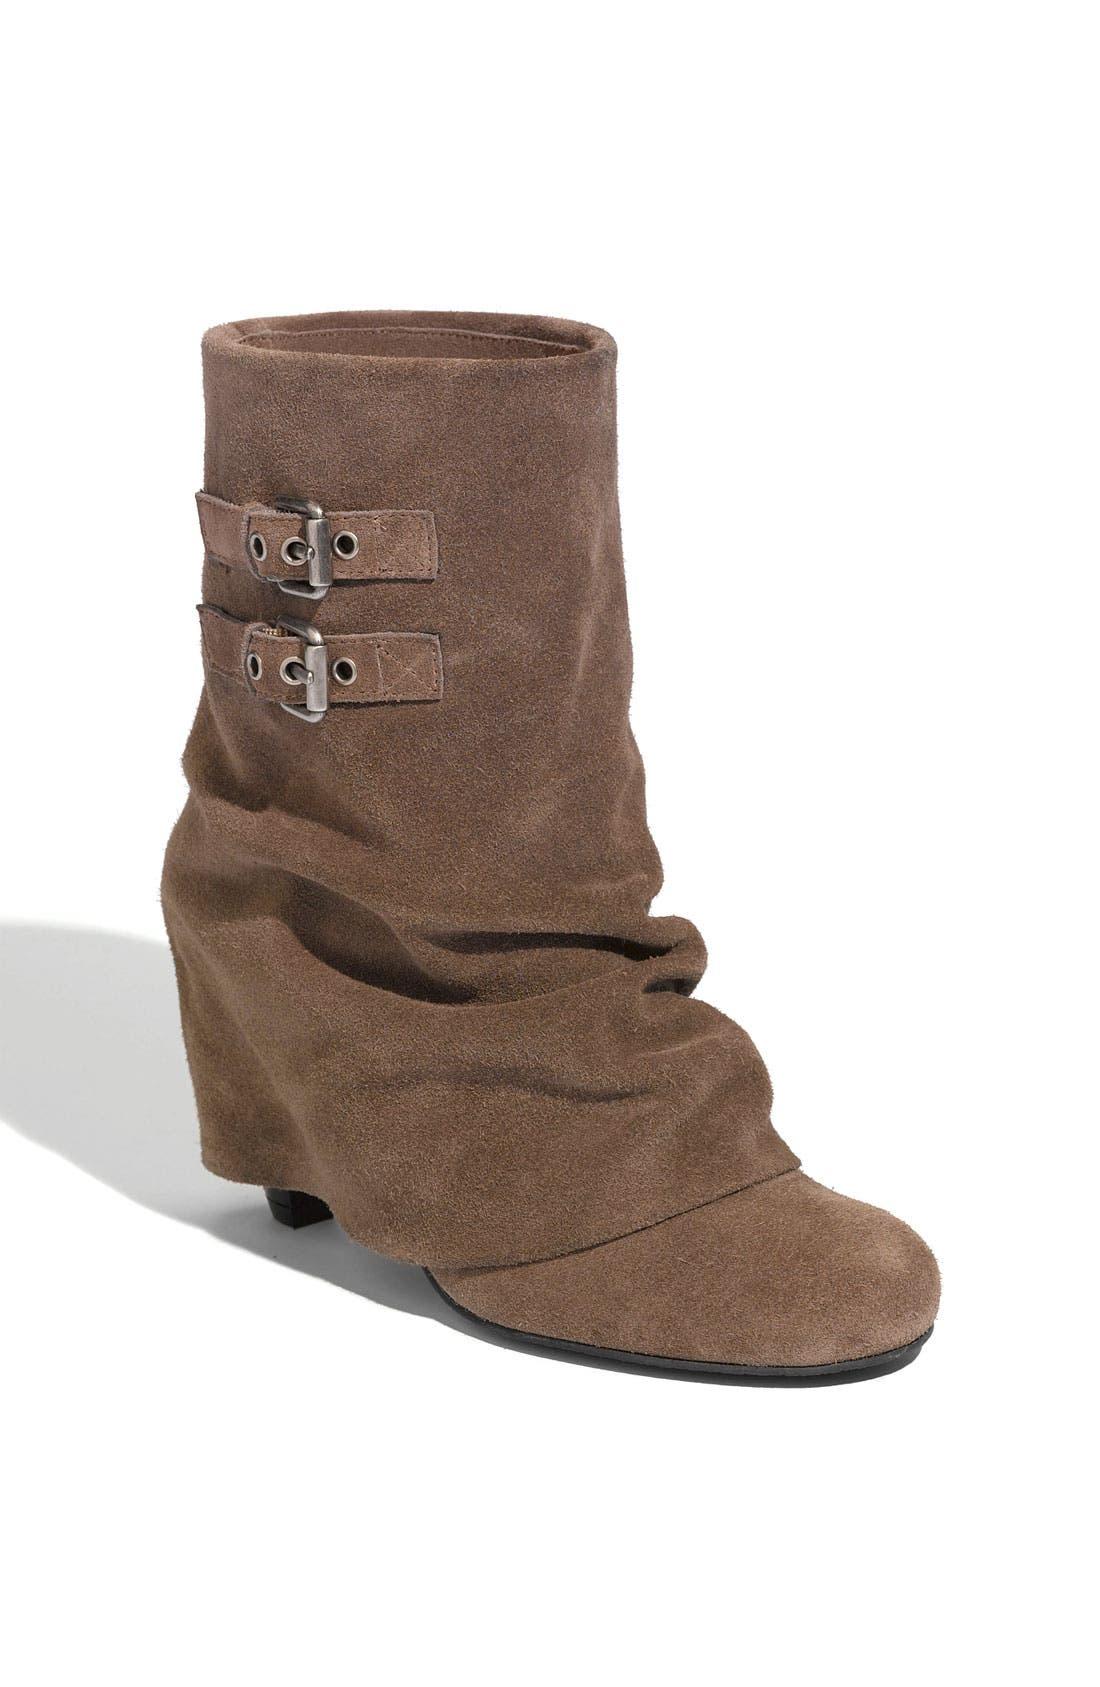 Alternate Image 1 Selected - BP. 'Division' Boot